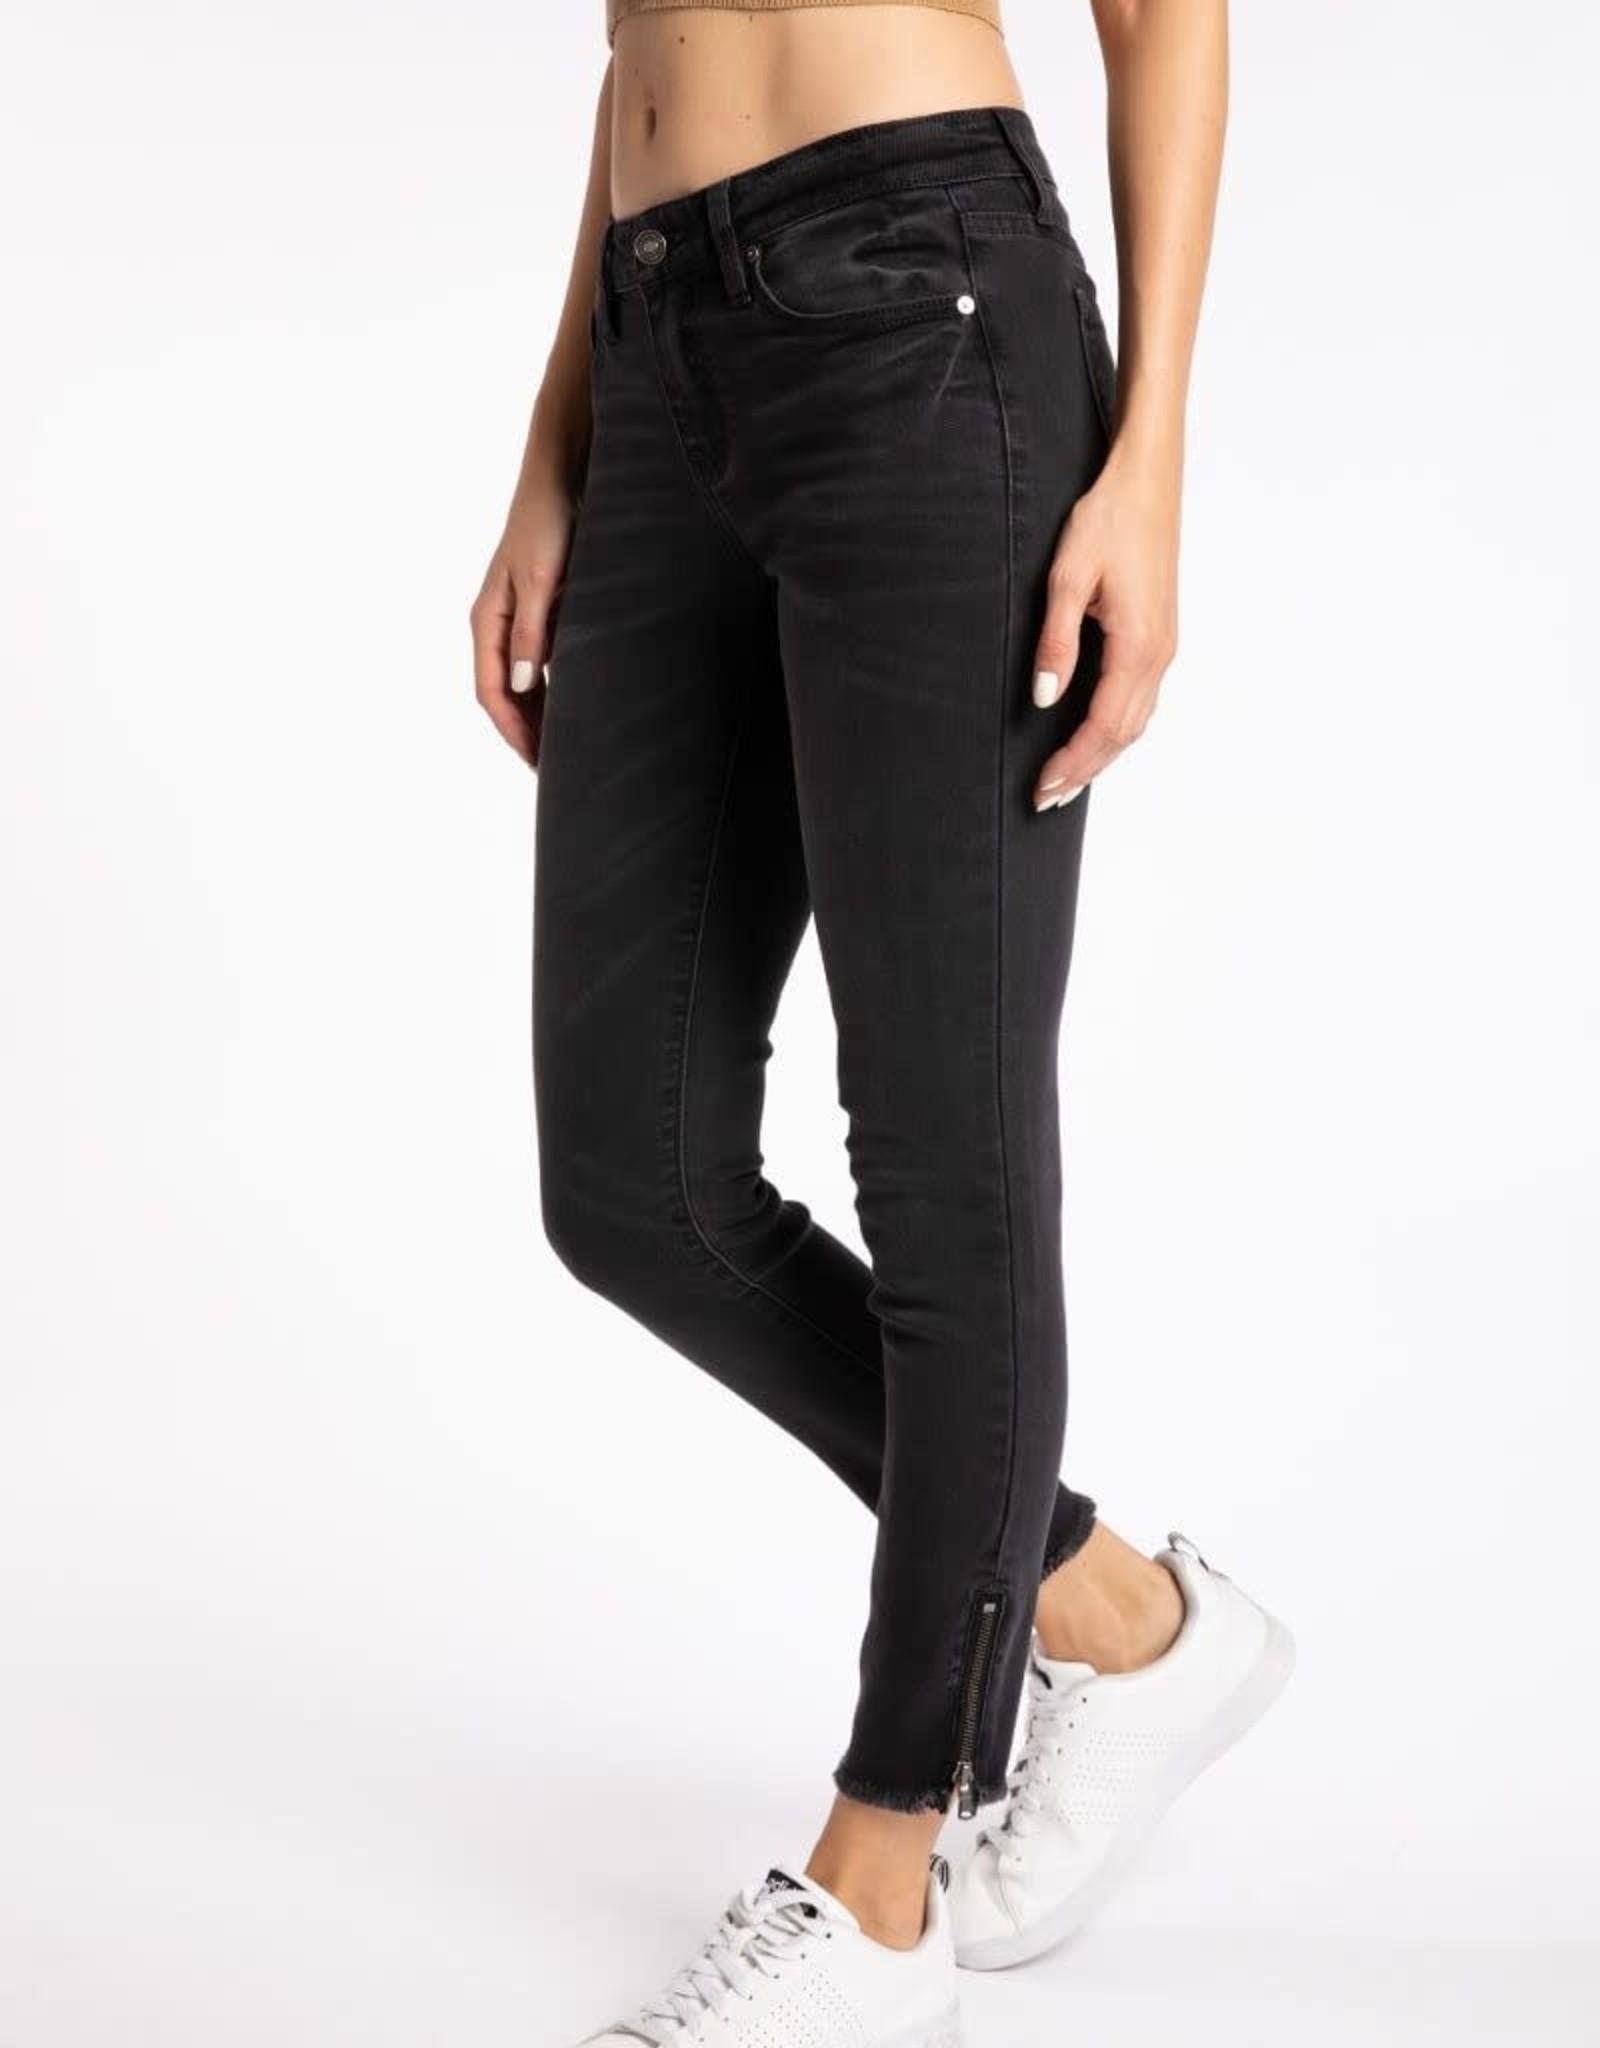 KanCan Mid Rise Black Jean w/Ankle Zipper